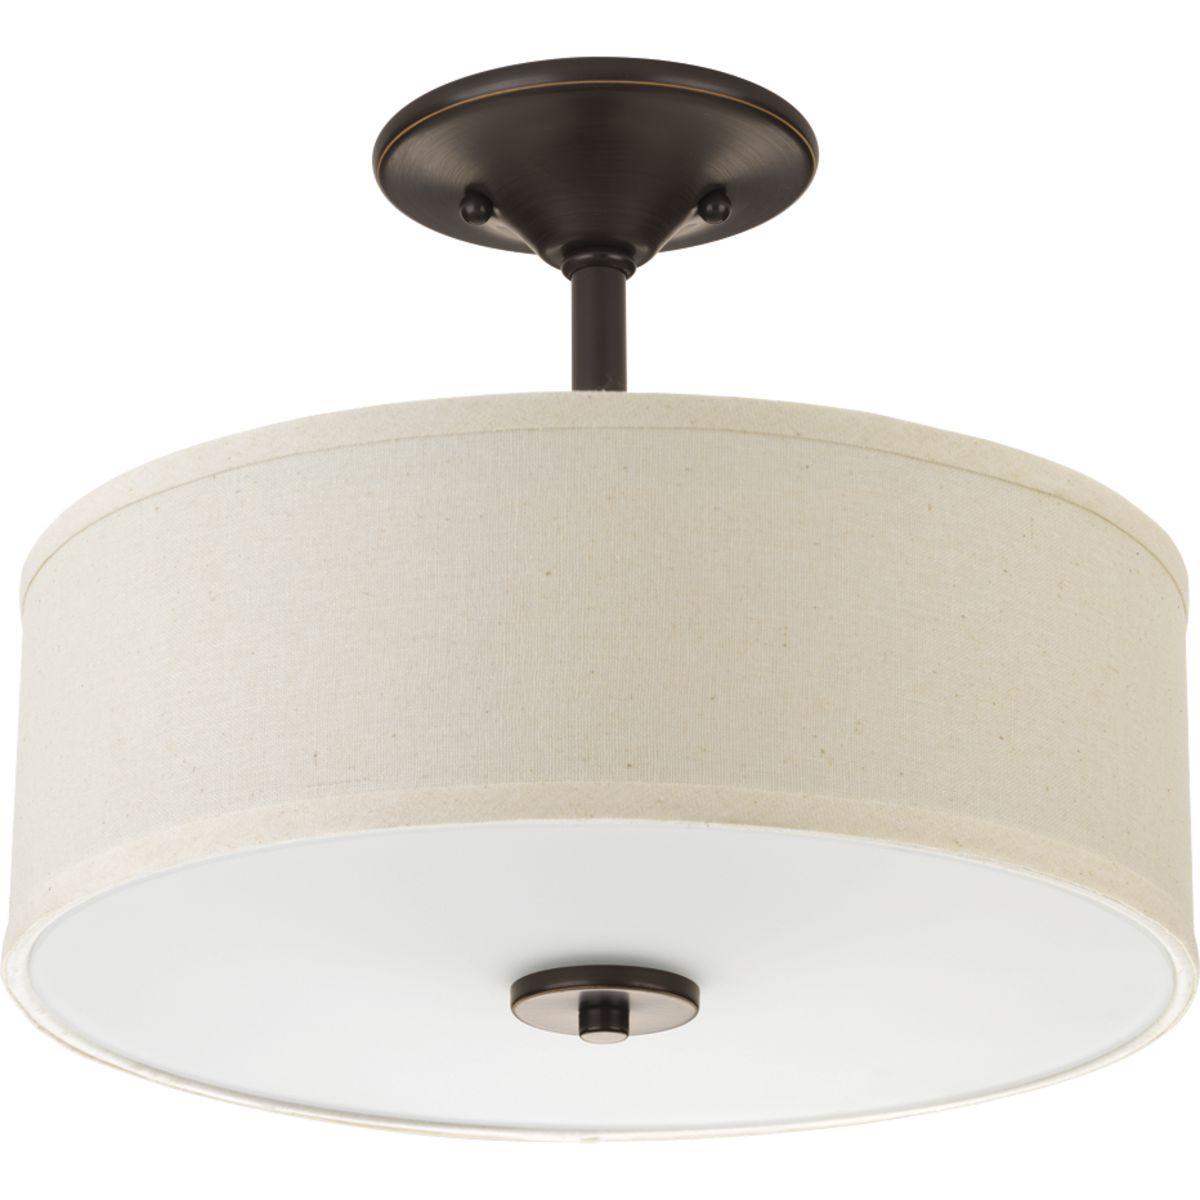 Inspire Collection Two Light 13 Semi Flush P3712 20 Progress Lighting